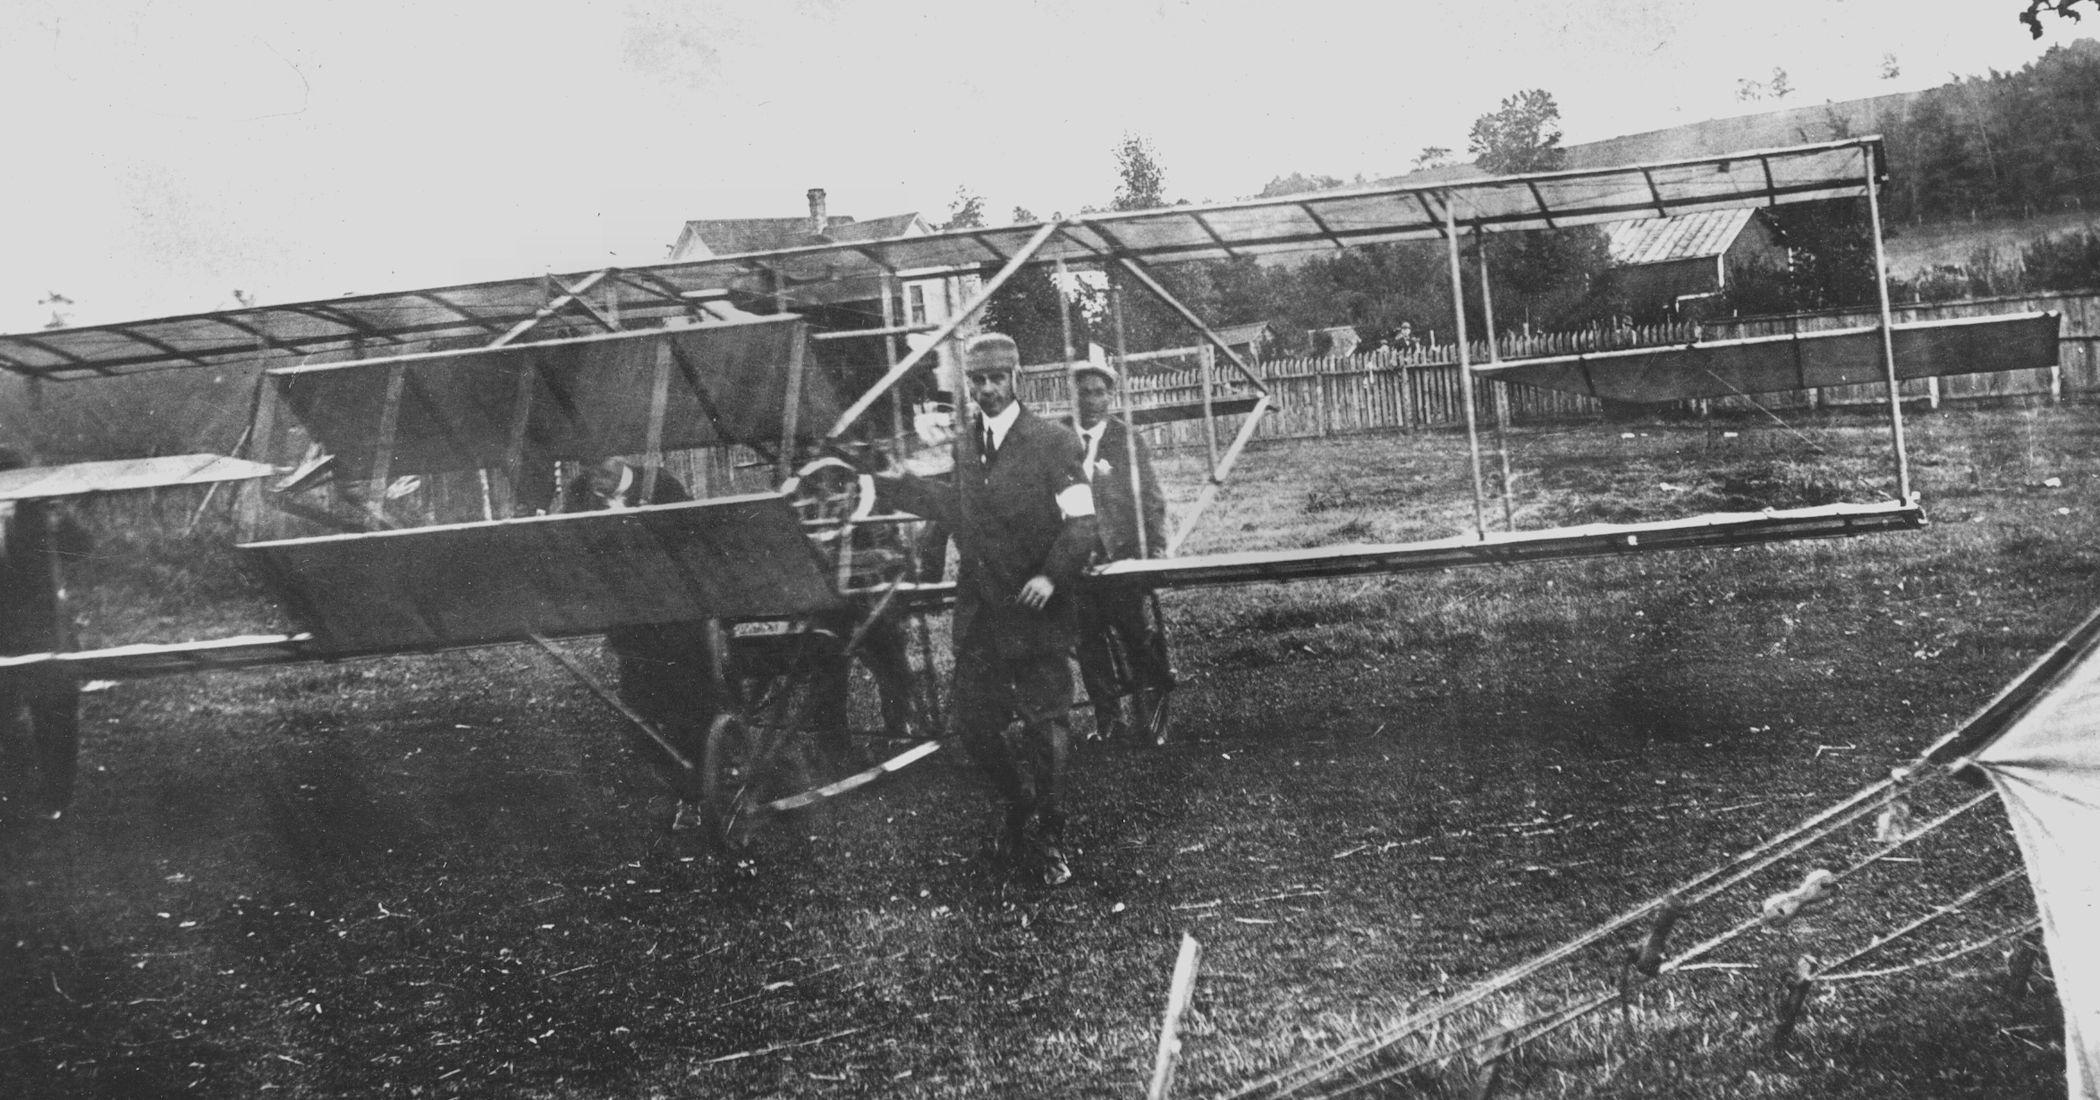 Nelson's Aeroplane at Baraboo Fairgrounds 1911